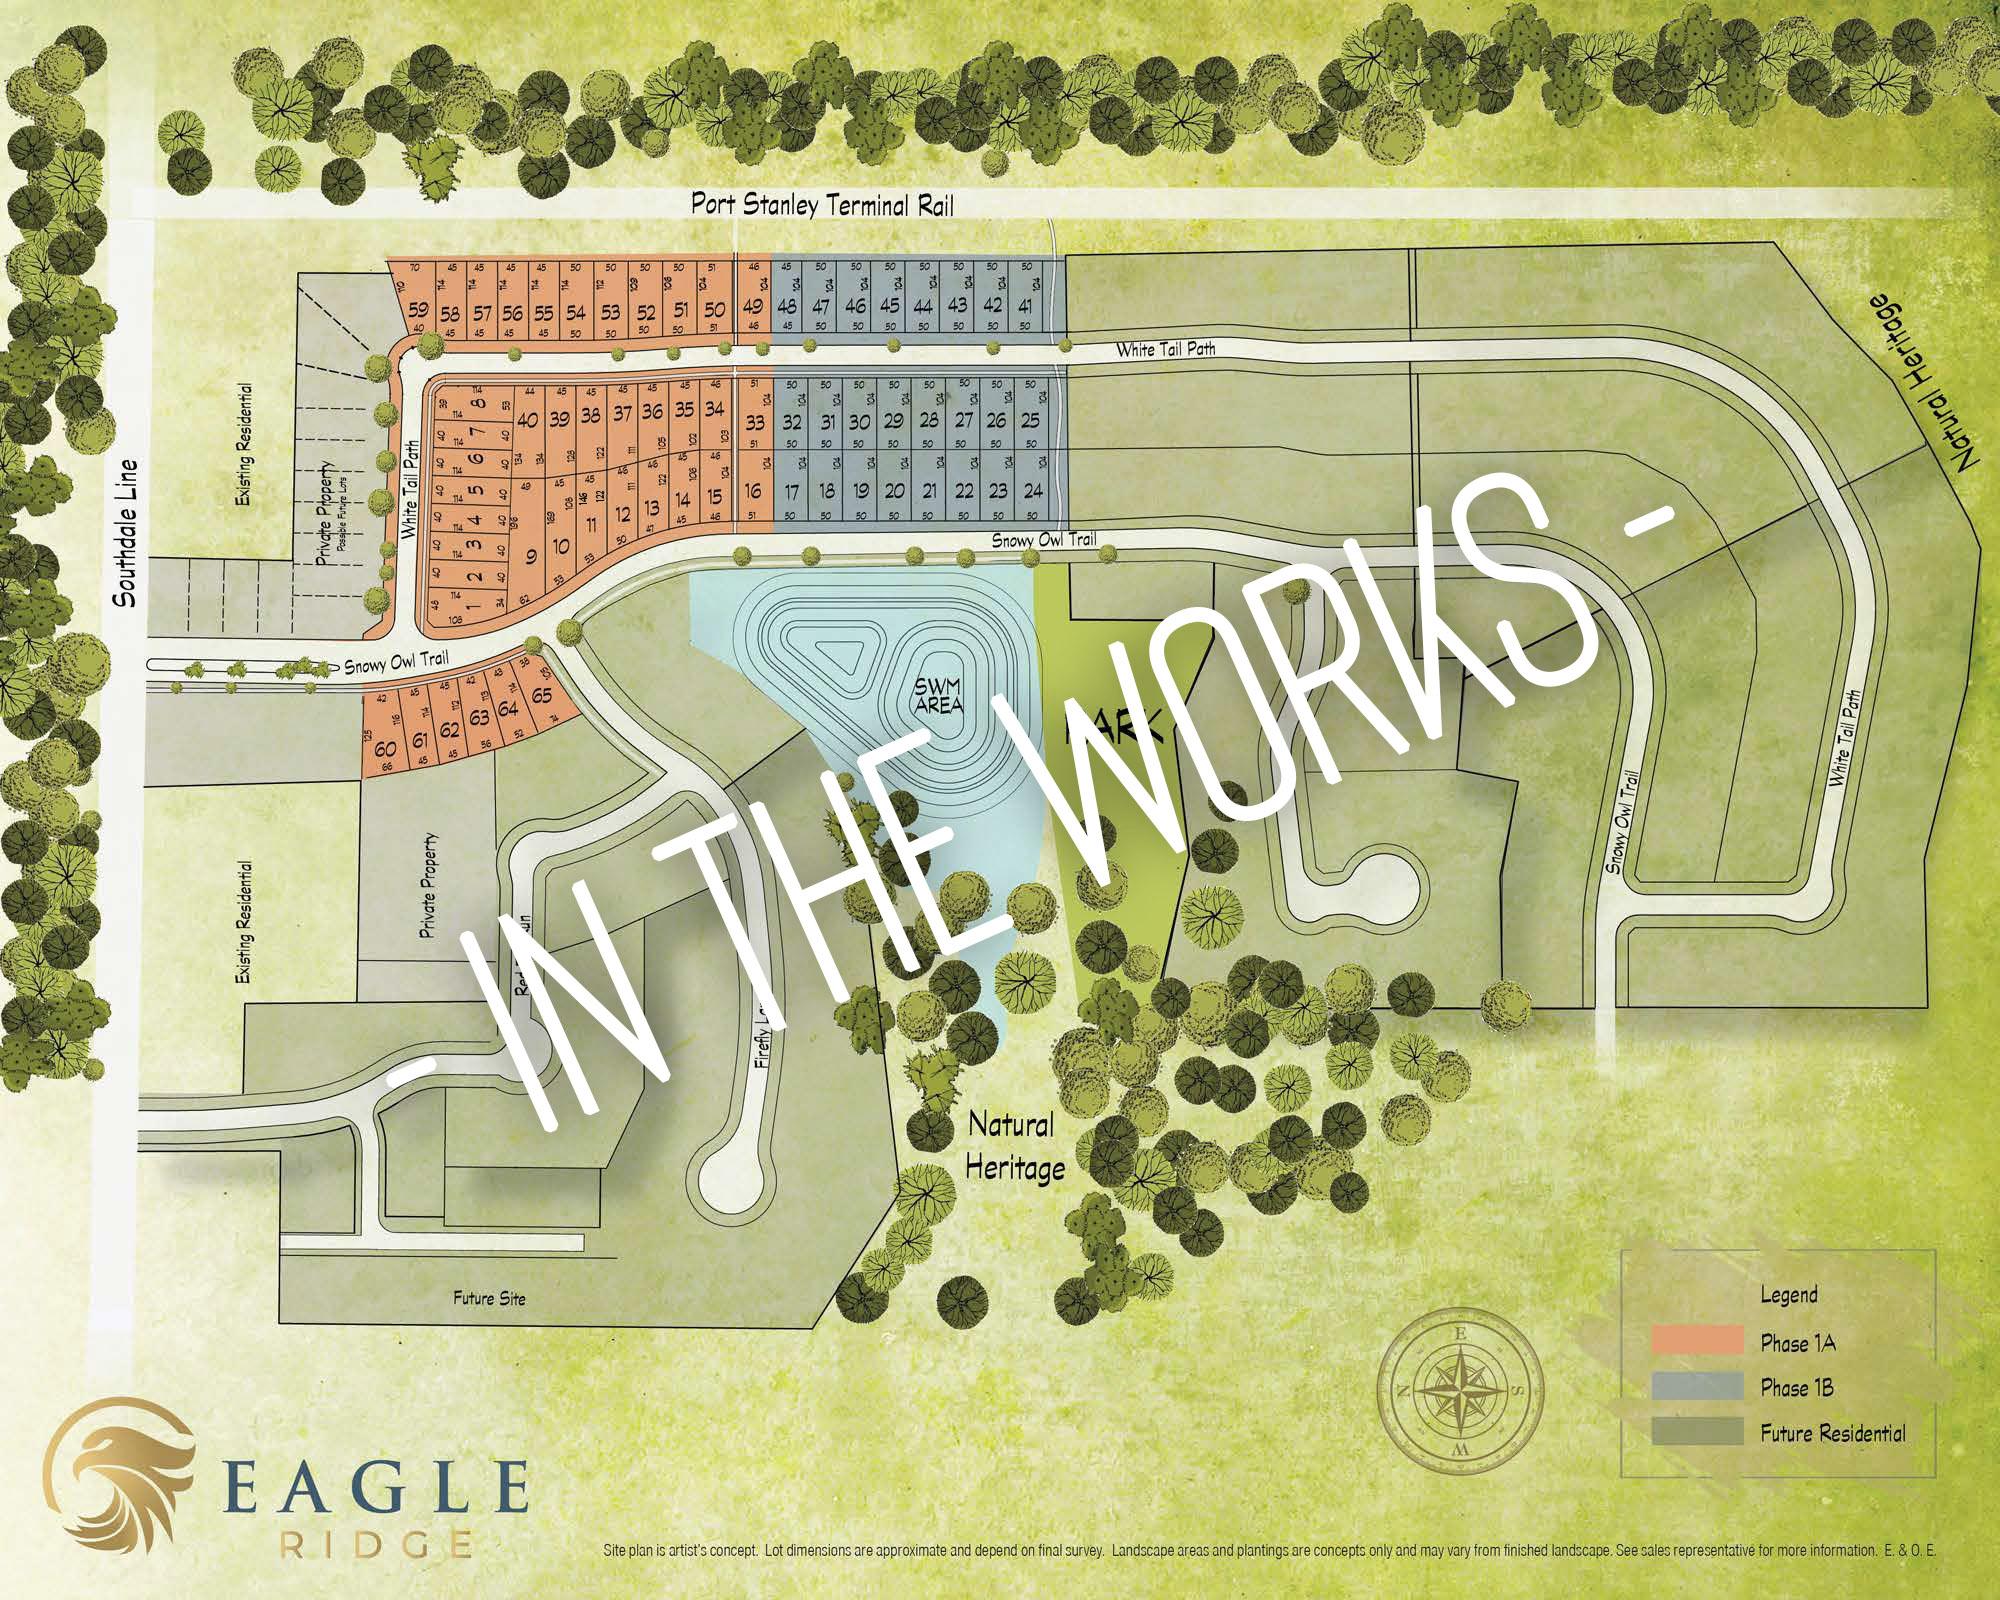 Eagle Ridge Phase 1A